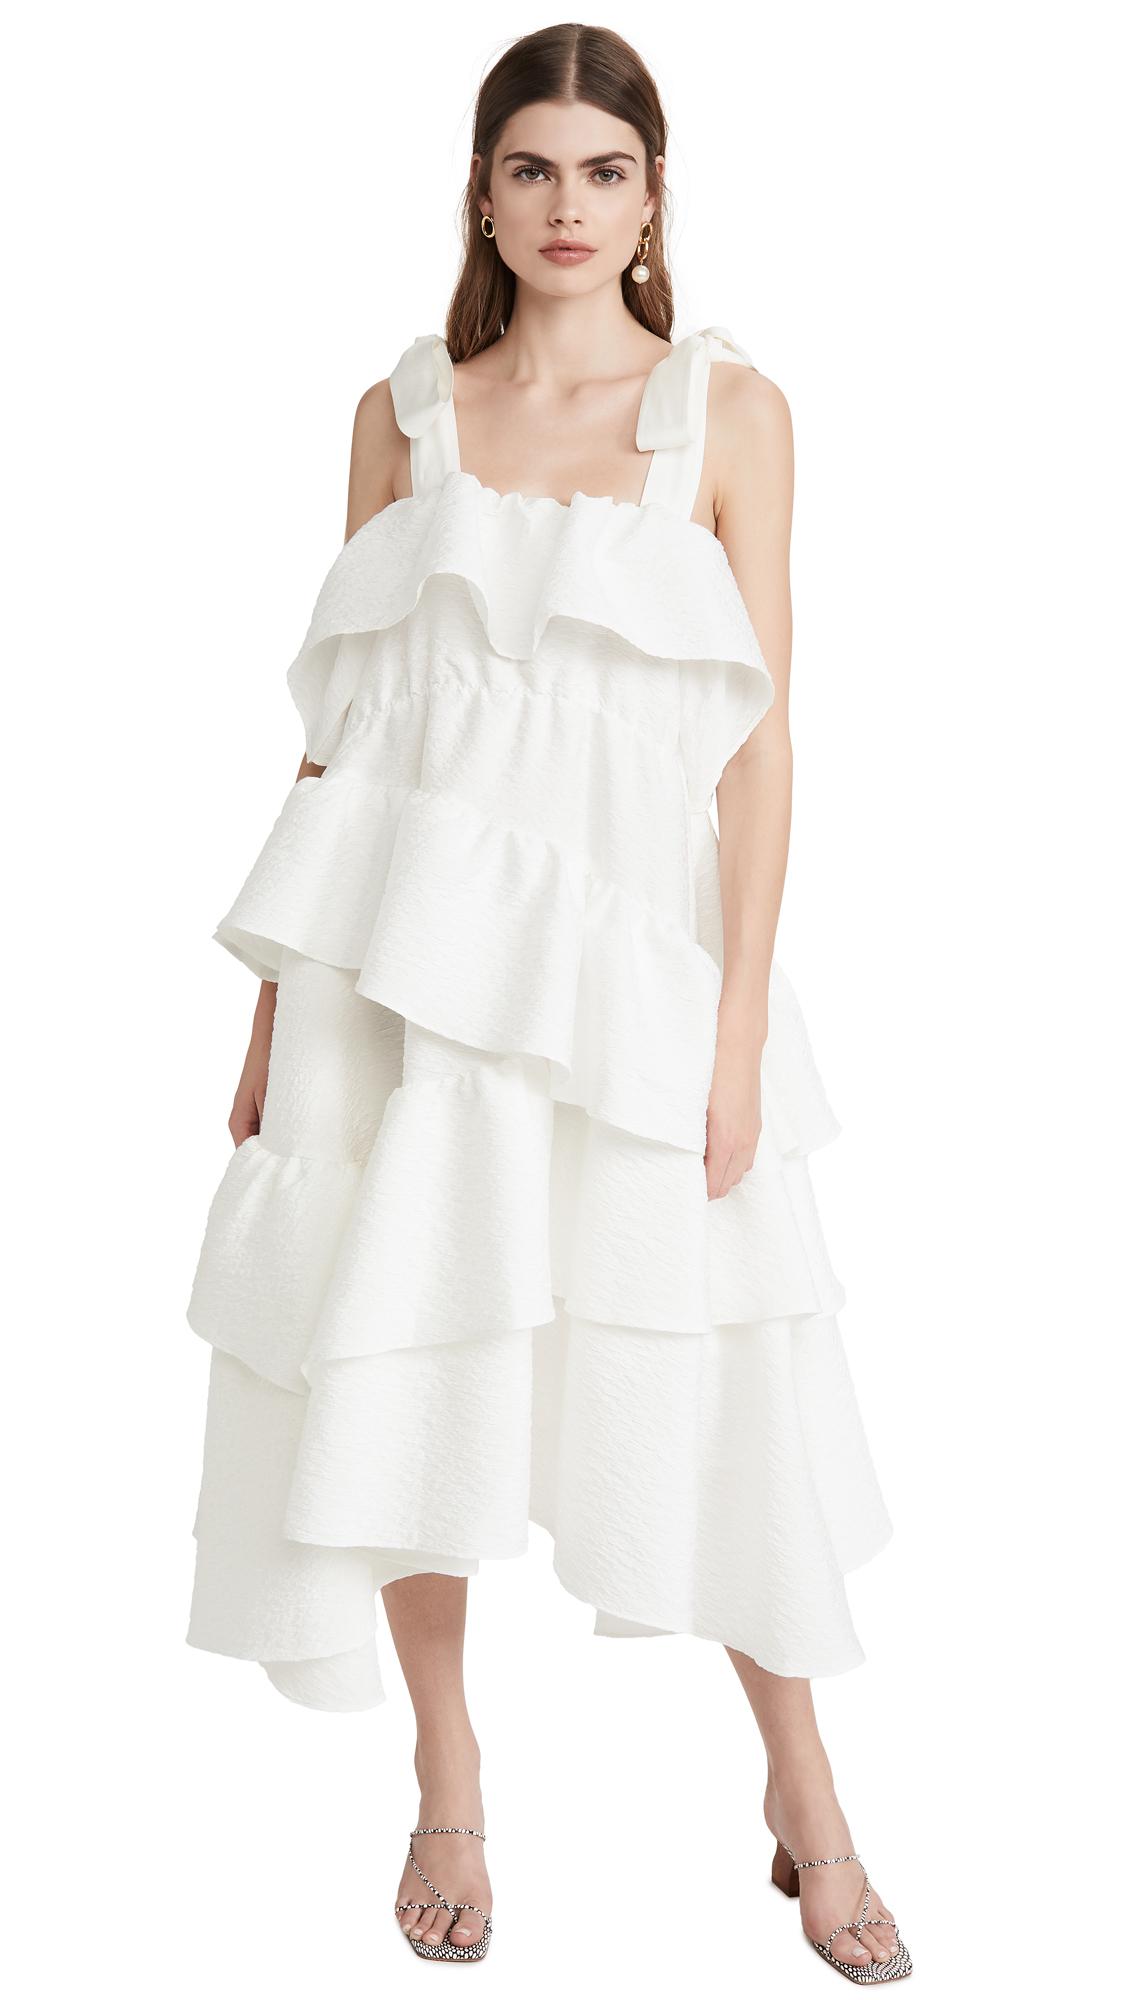 GOEN.J Asymmetric Ruffled and Gathered Leopard Matelasse Dress - 40% Off Sale